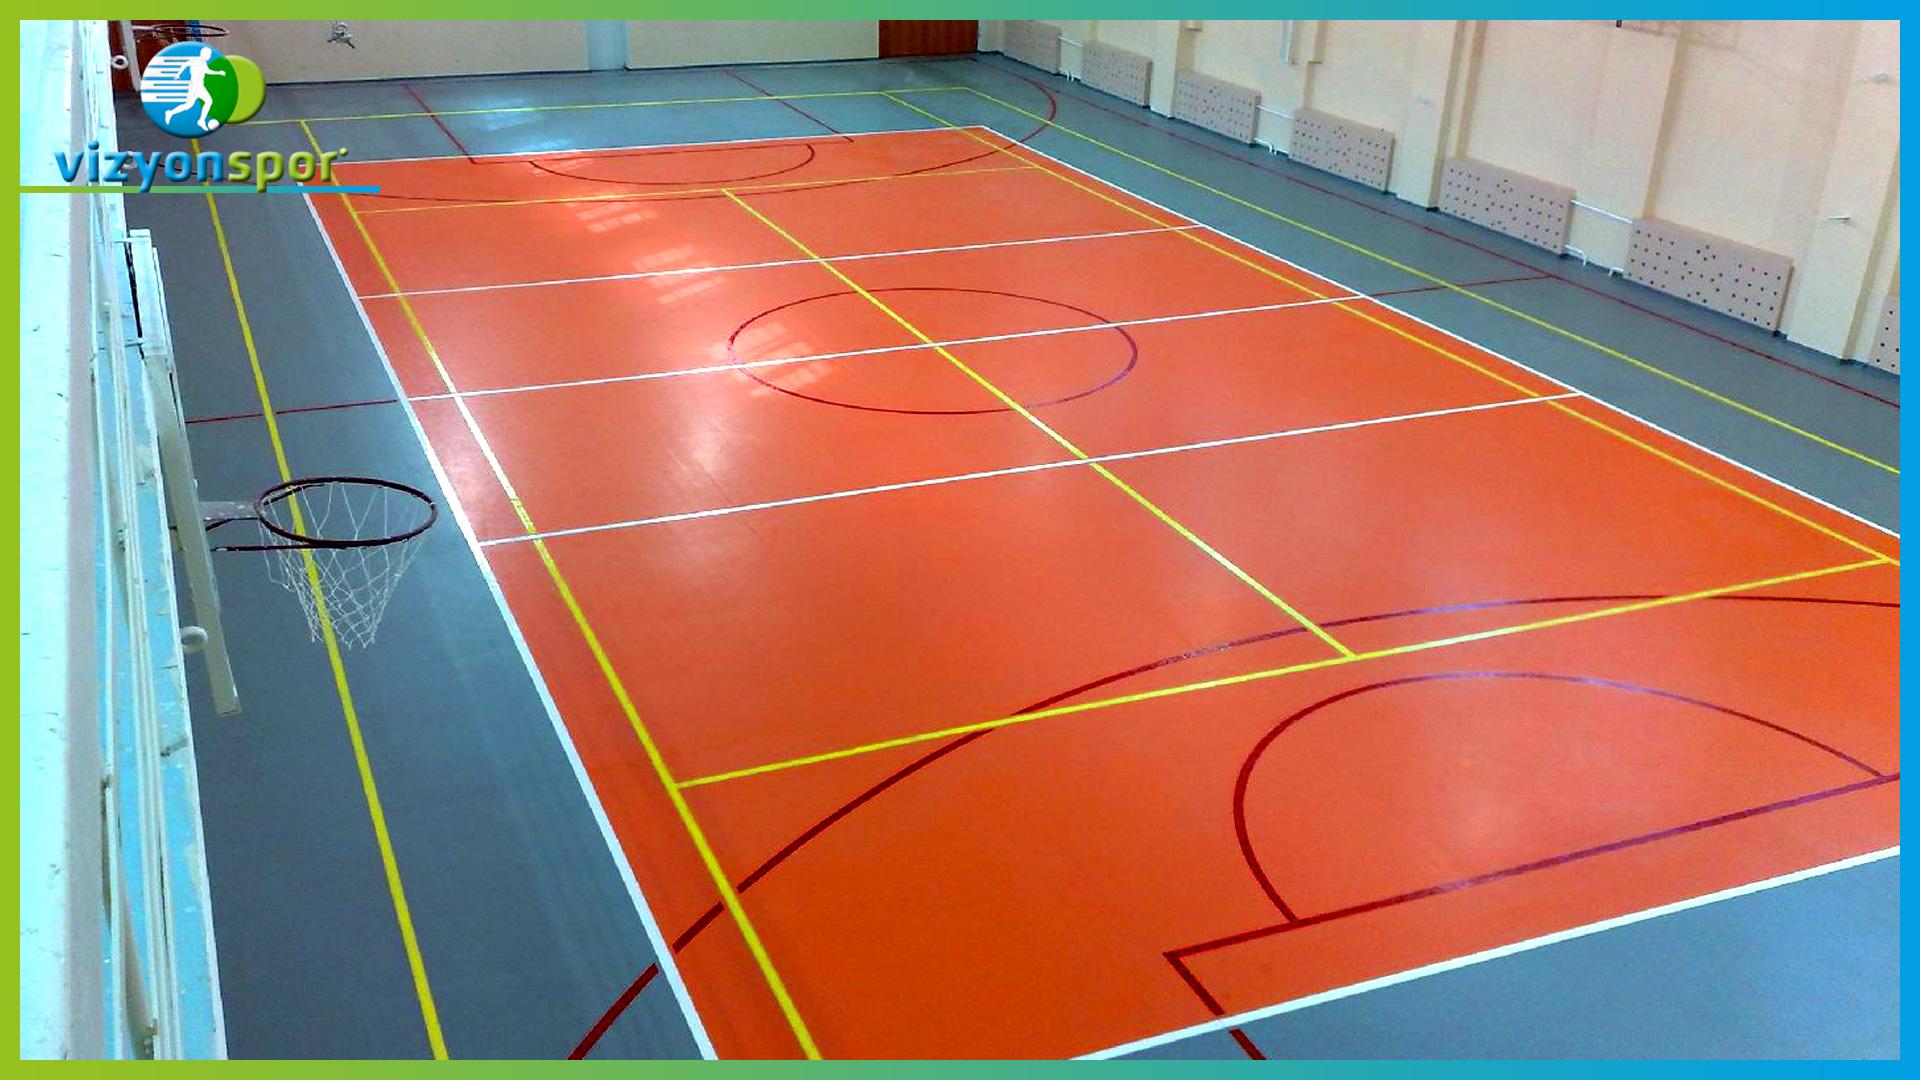 akrilik basketbol sahası, akrilik saha, akrilik basketbol, basketbol sahası,